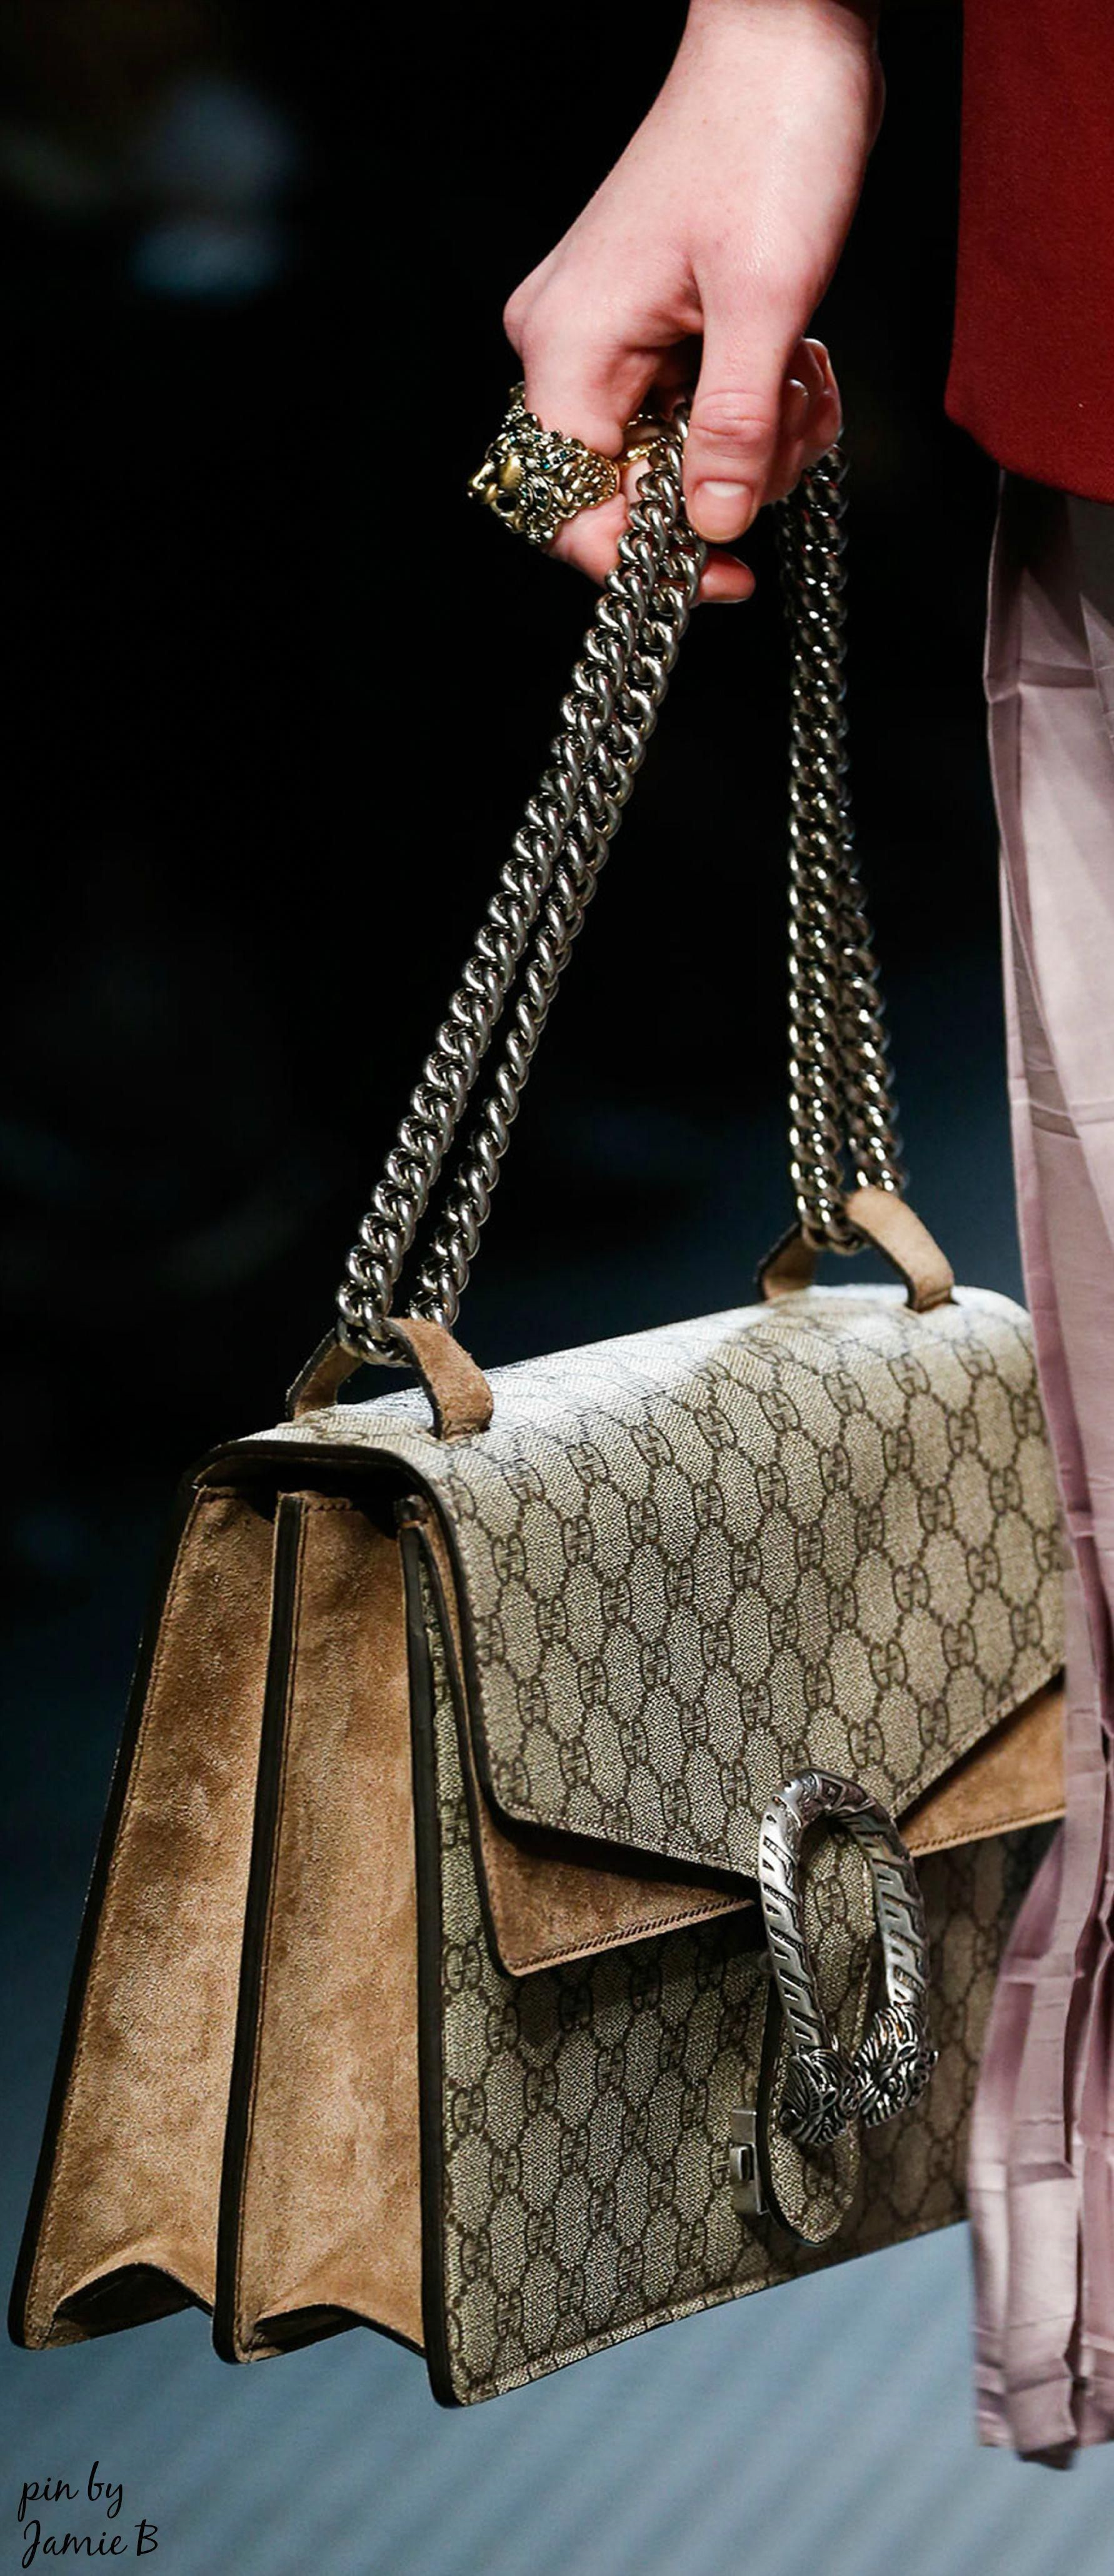 Gucci Fall 2017 Dionysus Gg Supreme Canvas Shoulder Bag Ebony Taupe Guccihandbags